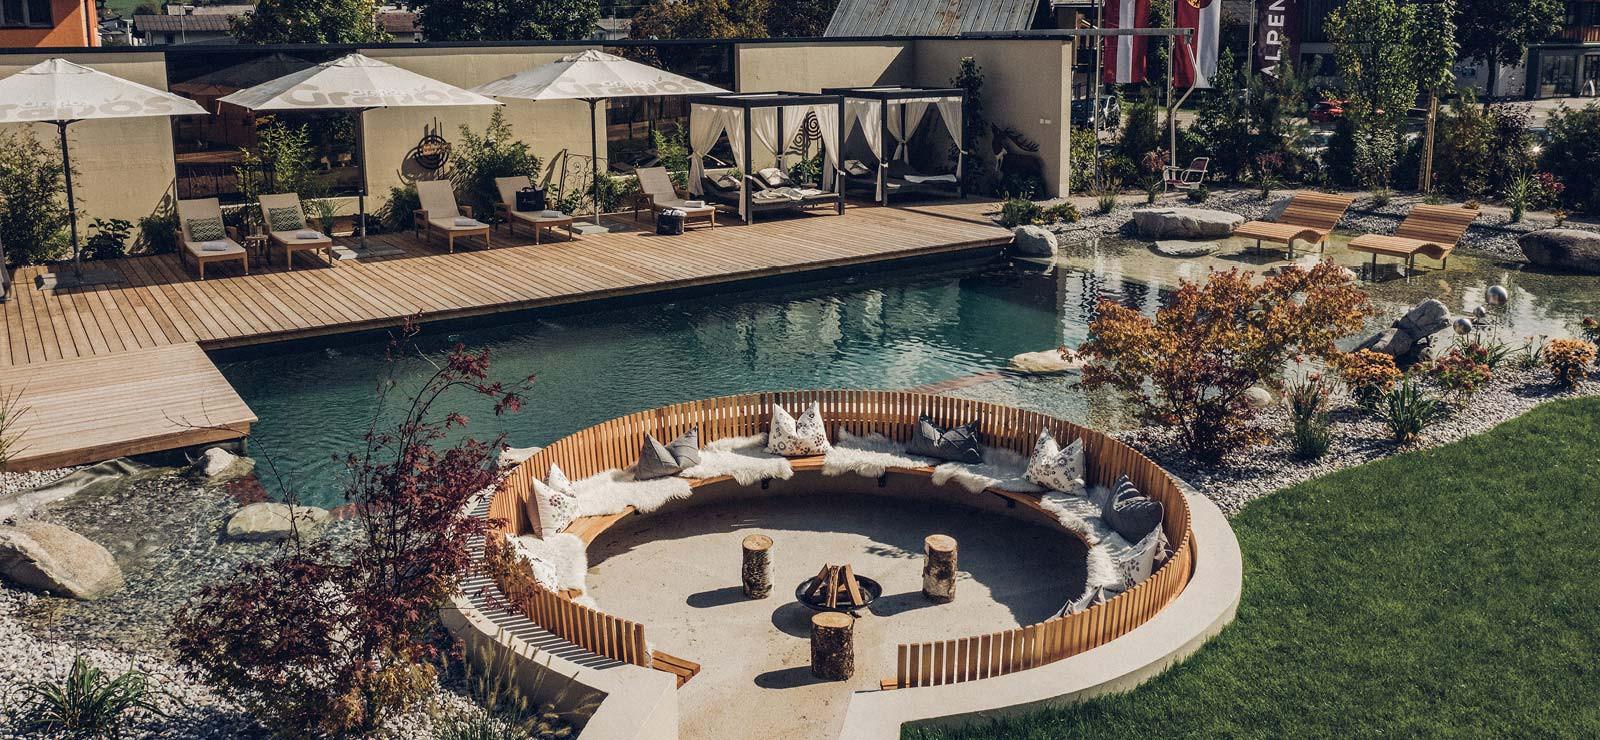 Sportresort Alpenblick Bilder | Bild 1